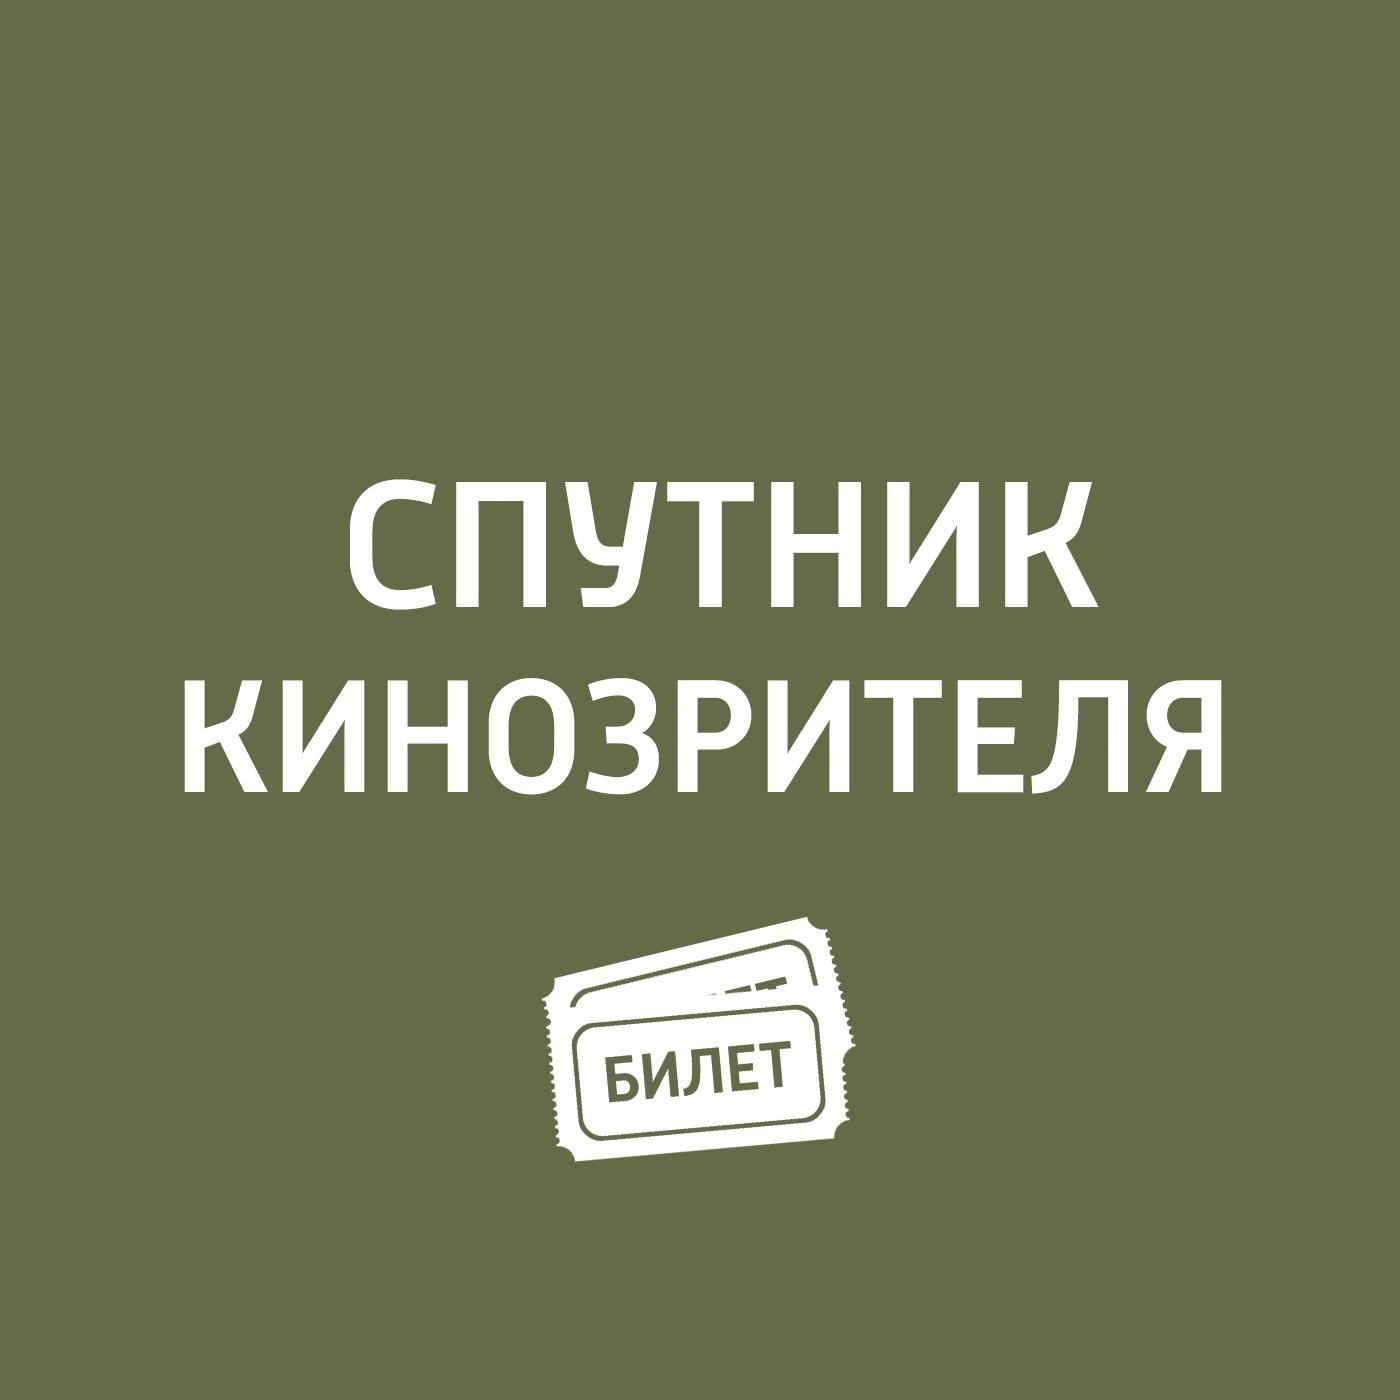 Антон Долин РЭД 2, «Смурфики 2, «Византия и др. vicking 2